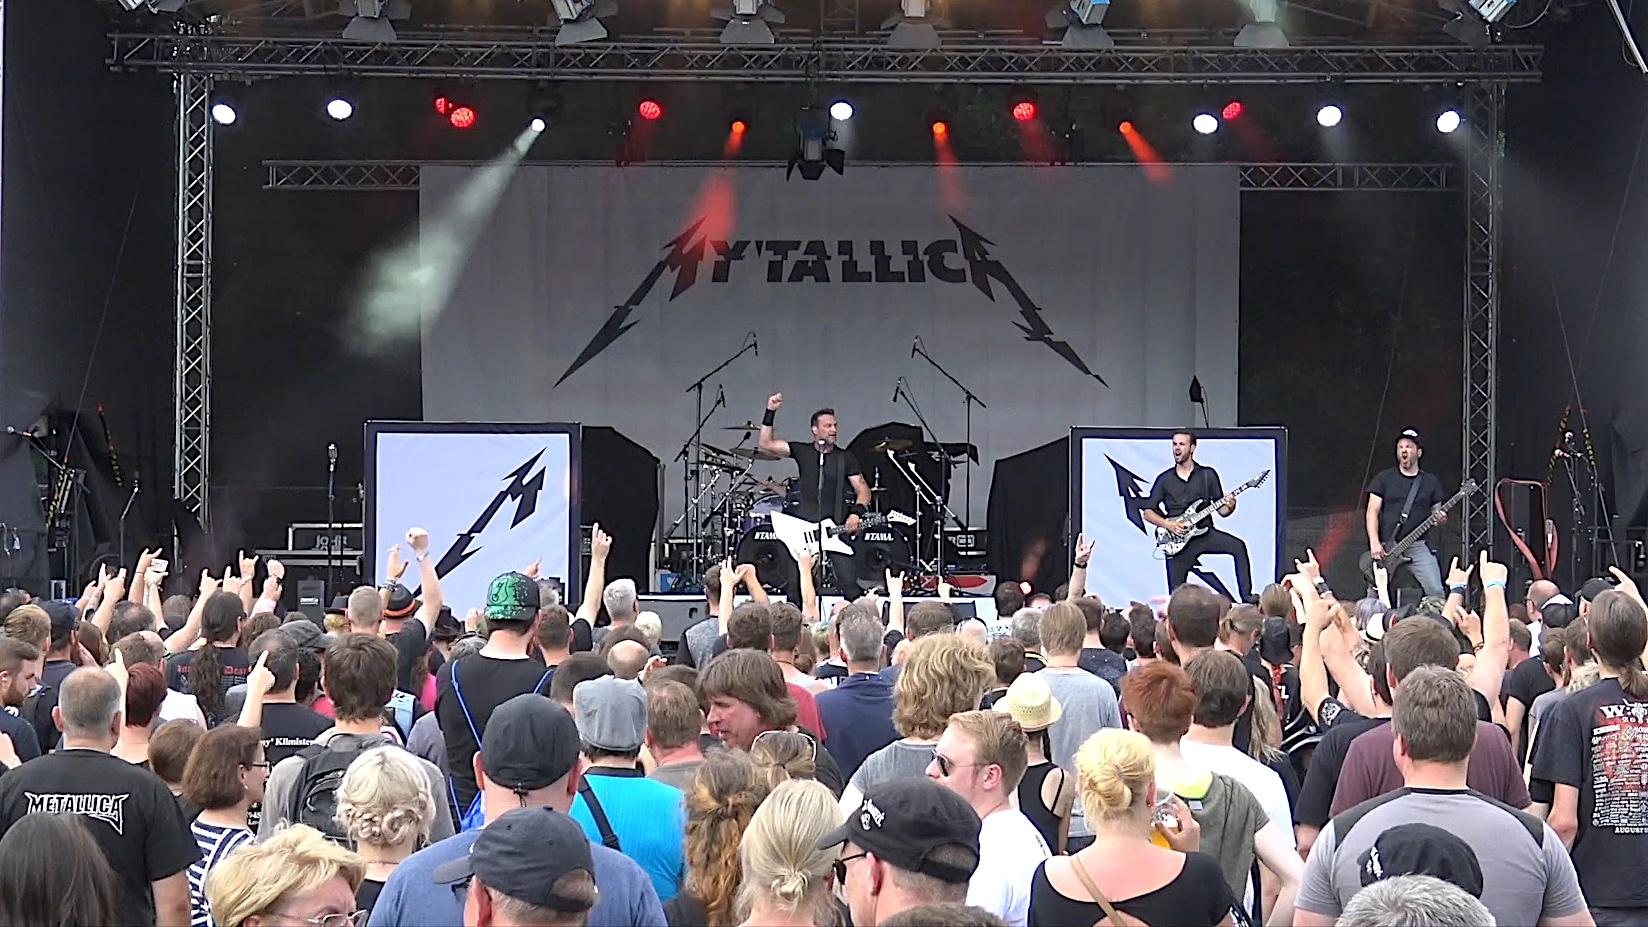 mytallica-dortmund-rock-n-tribute-festival-2017-stage-live